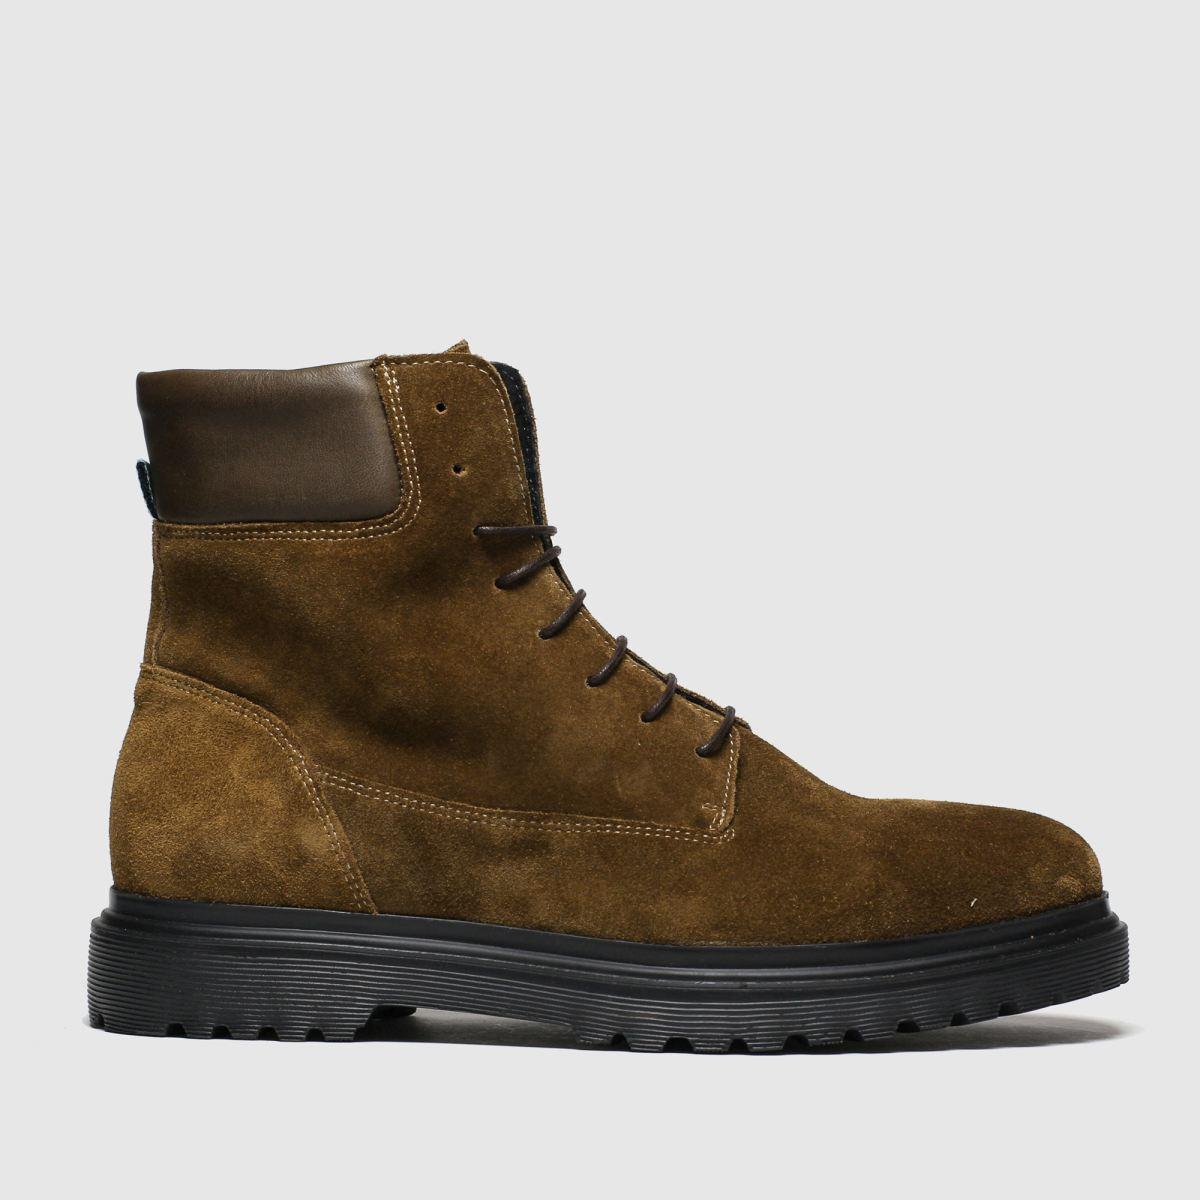 Shoe the Bear Shoe The Bear Tan Heard Boots